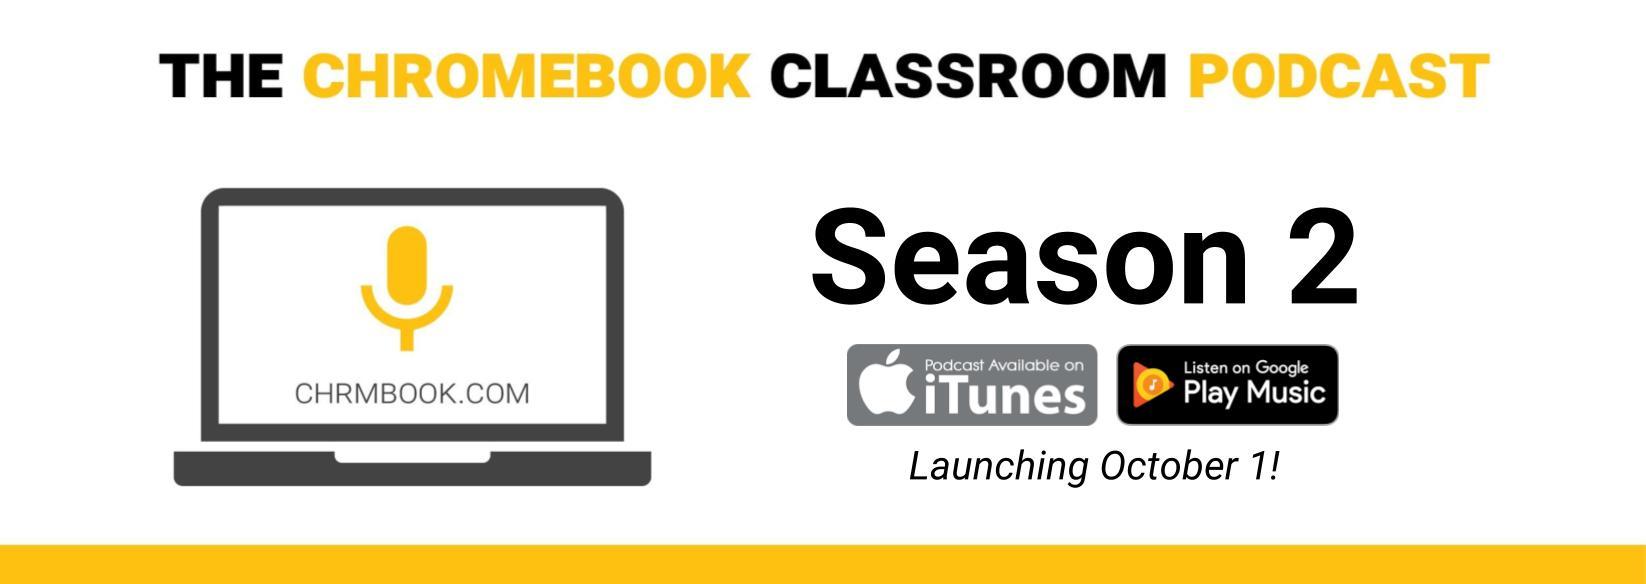 The Chromebook Classroom Podcast- Season 2 Introduction